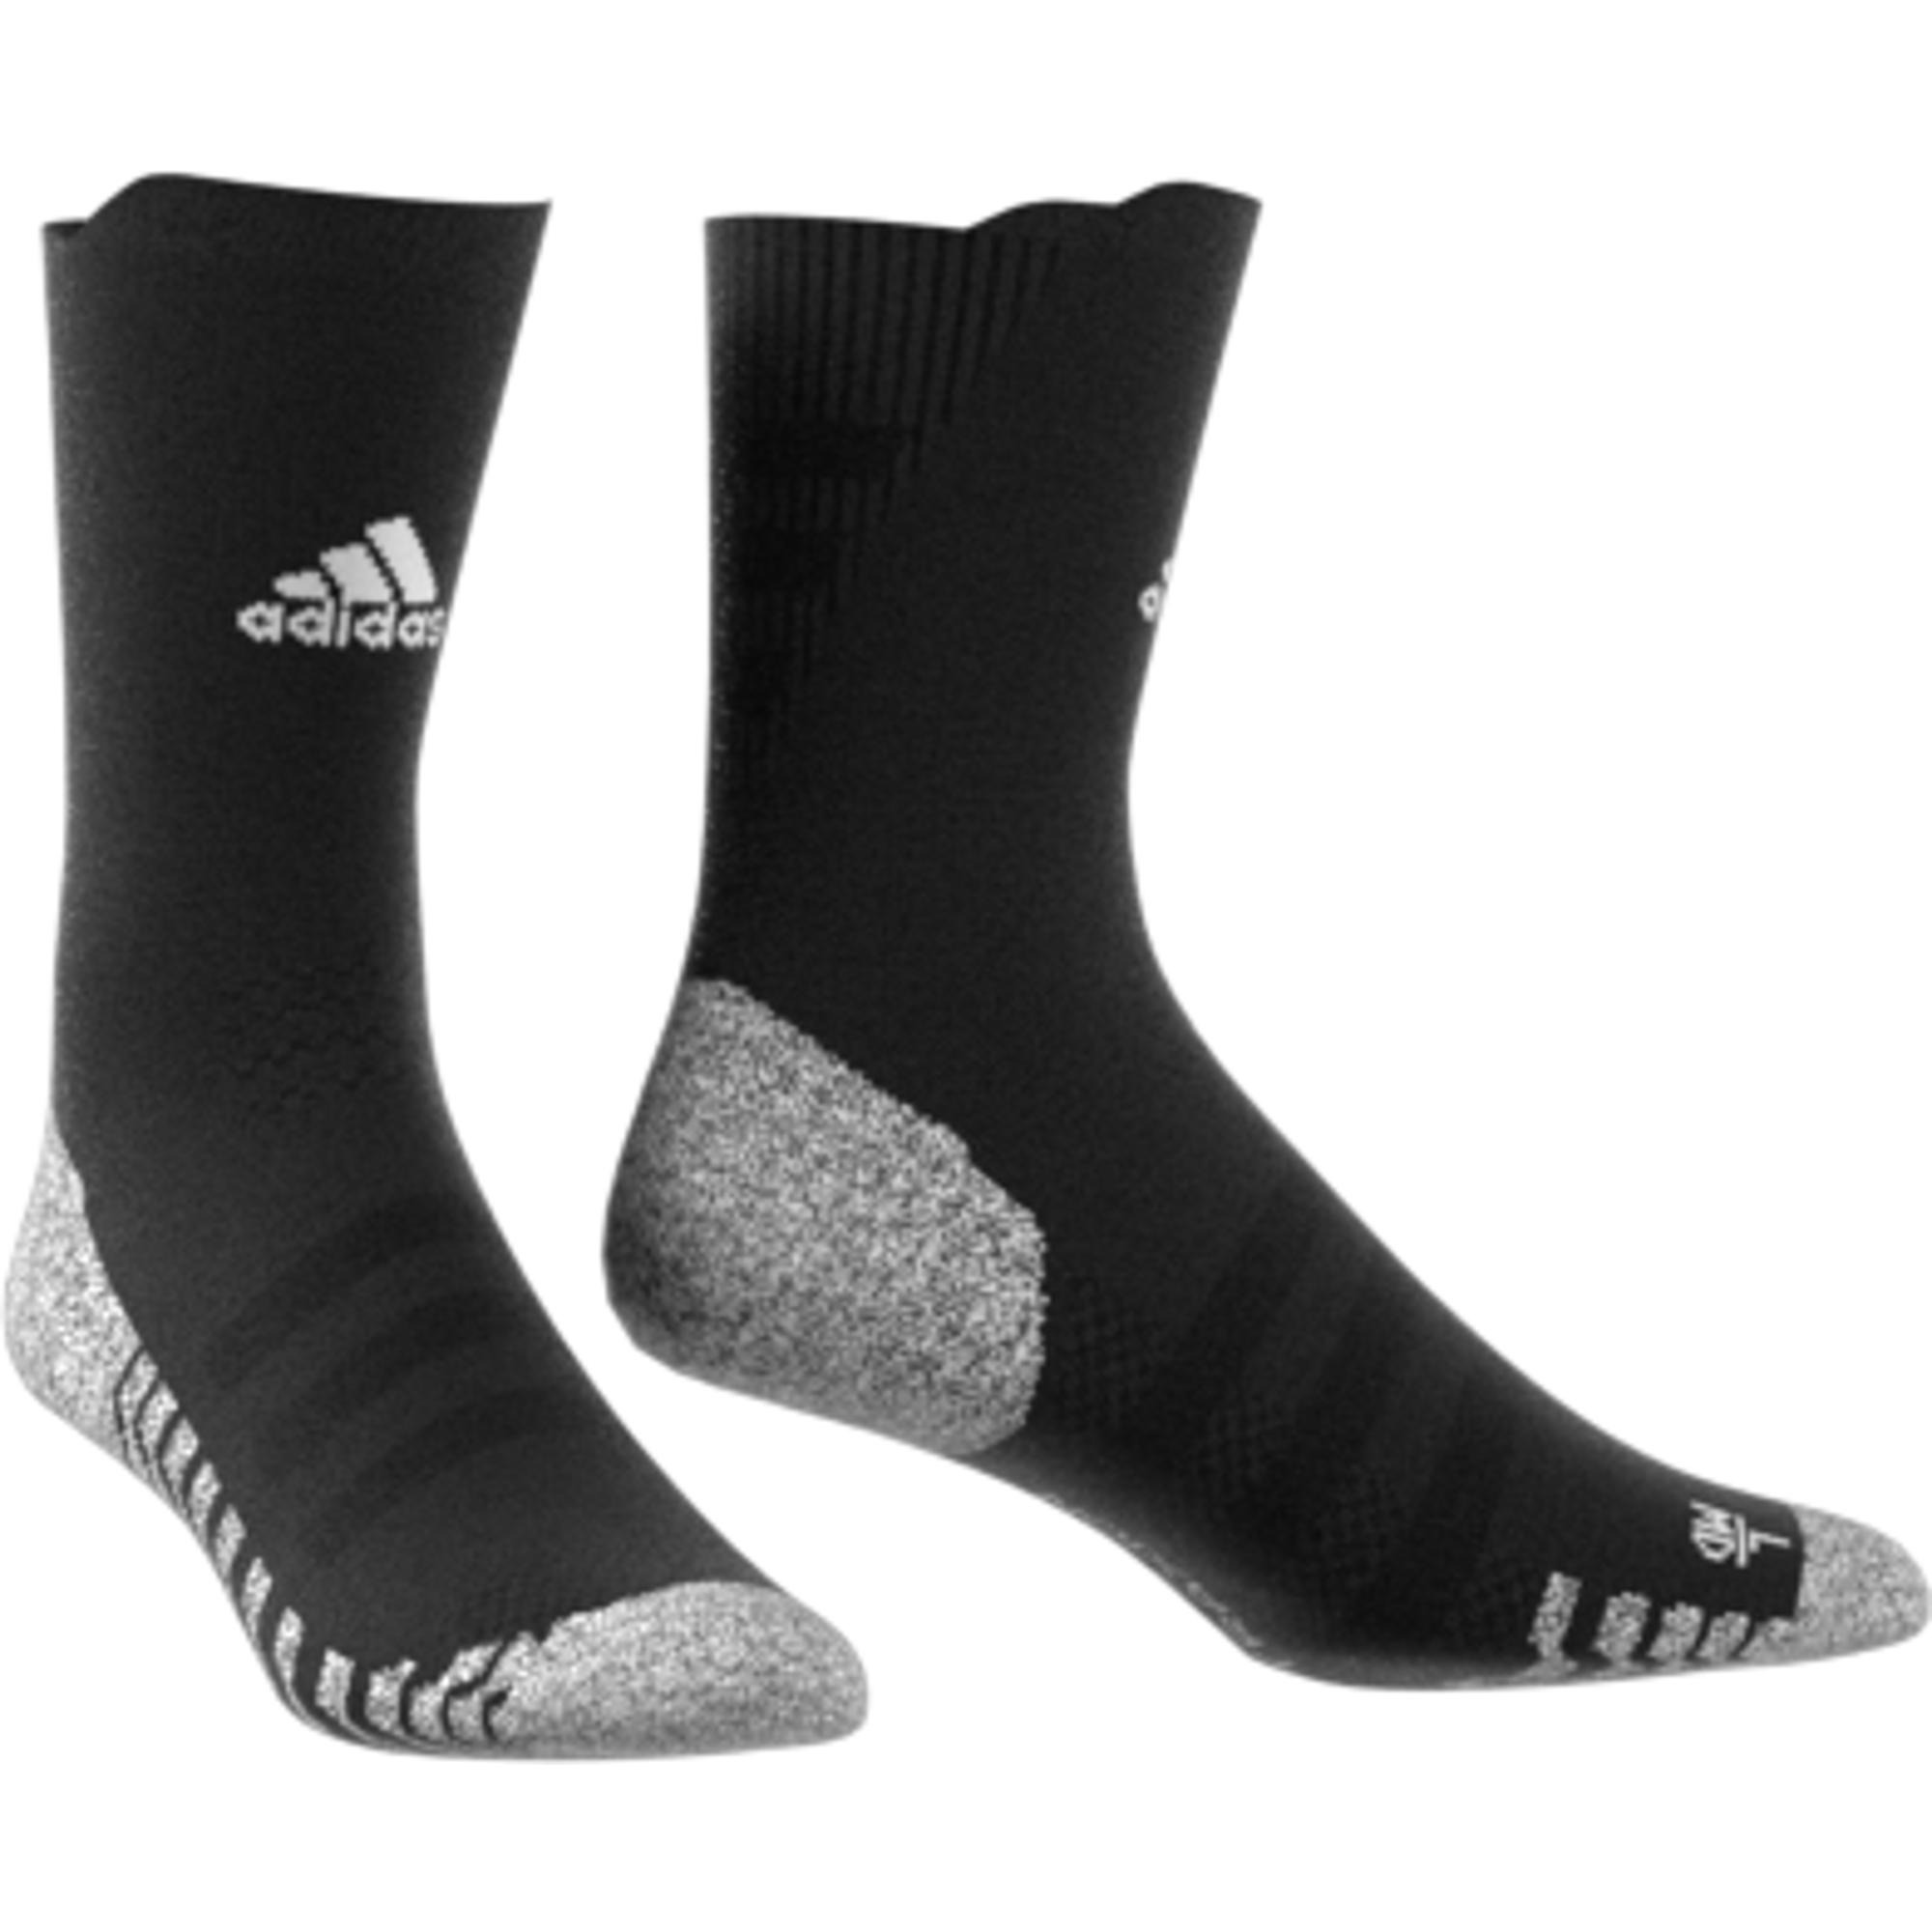 ADIDAS ponožky Low Cushion Traxion